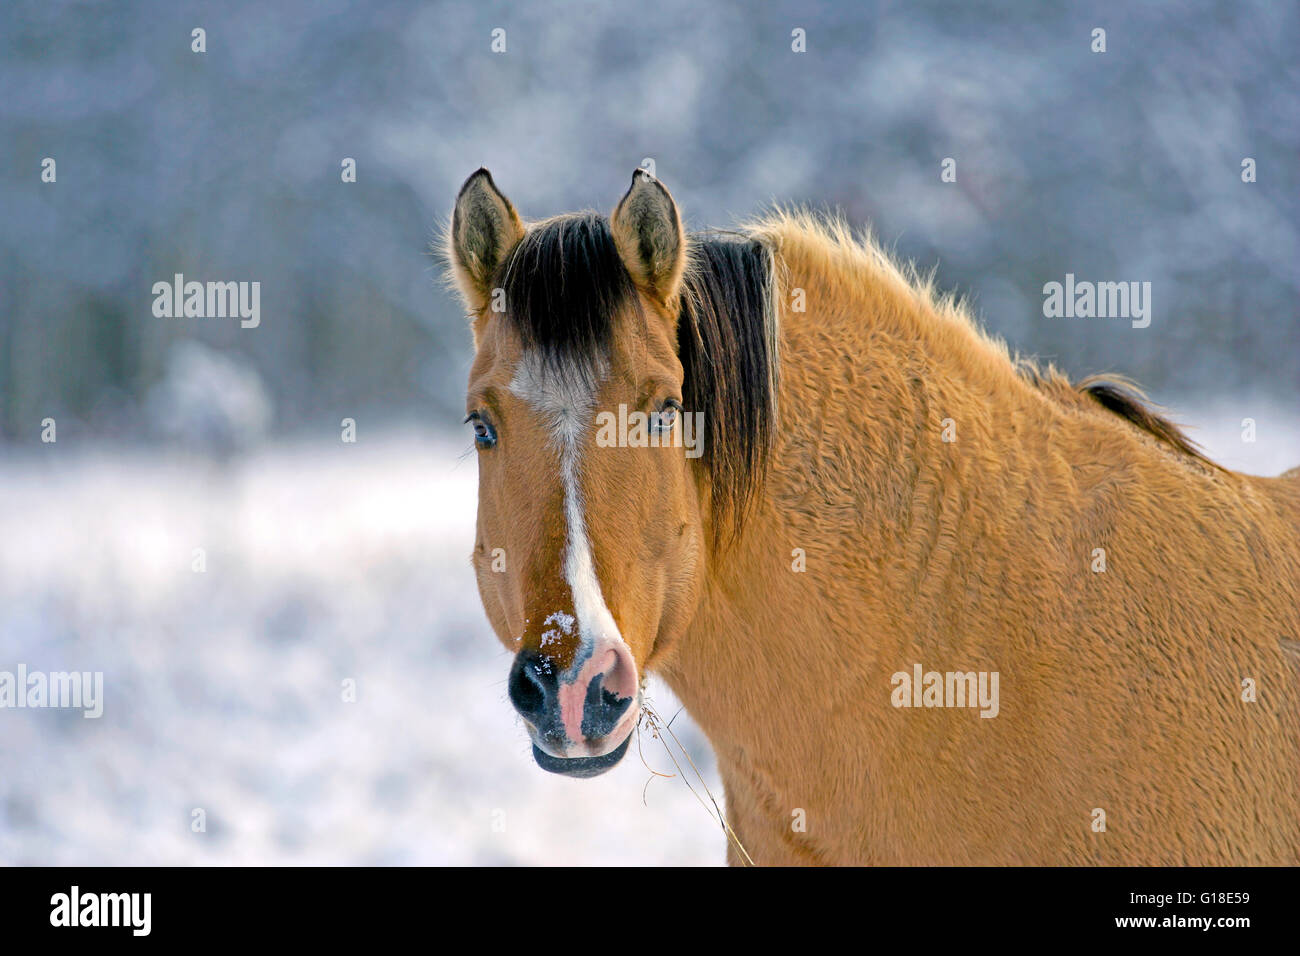 Fjord-Quarter-horse portrait, in winter - Stock Image